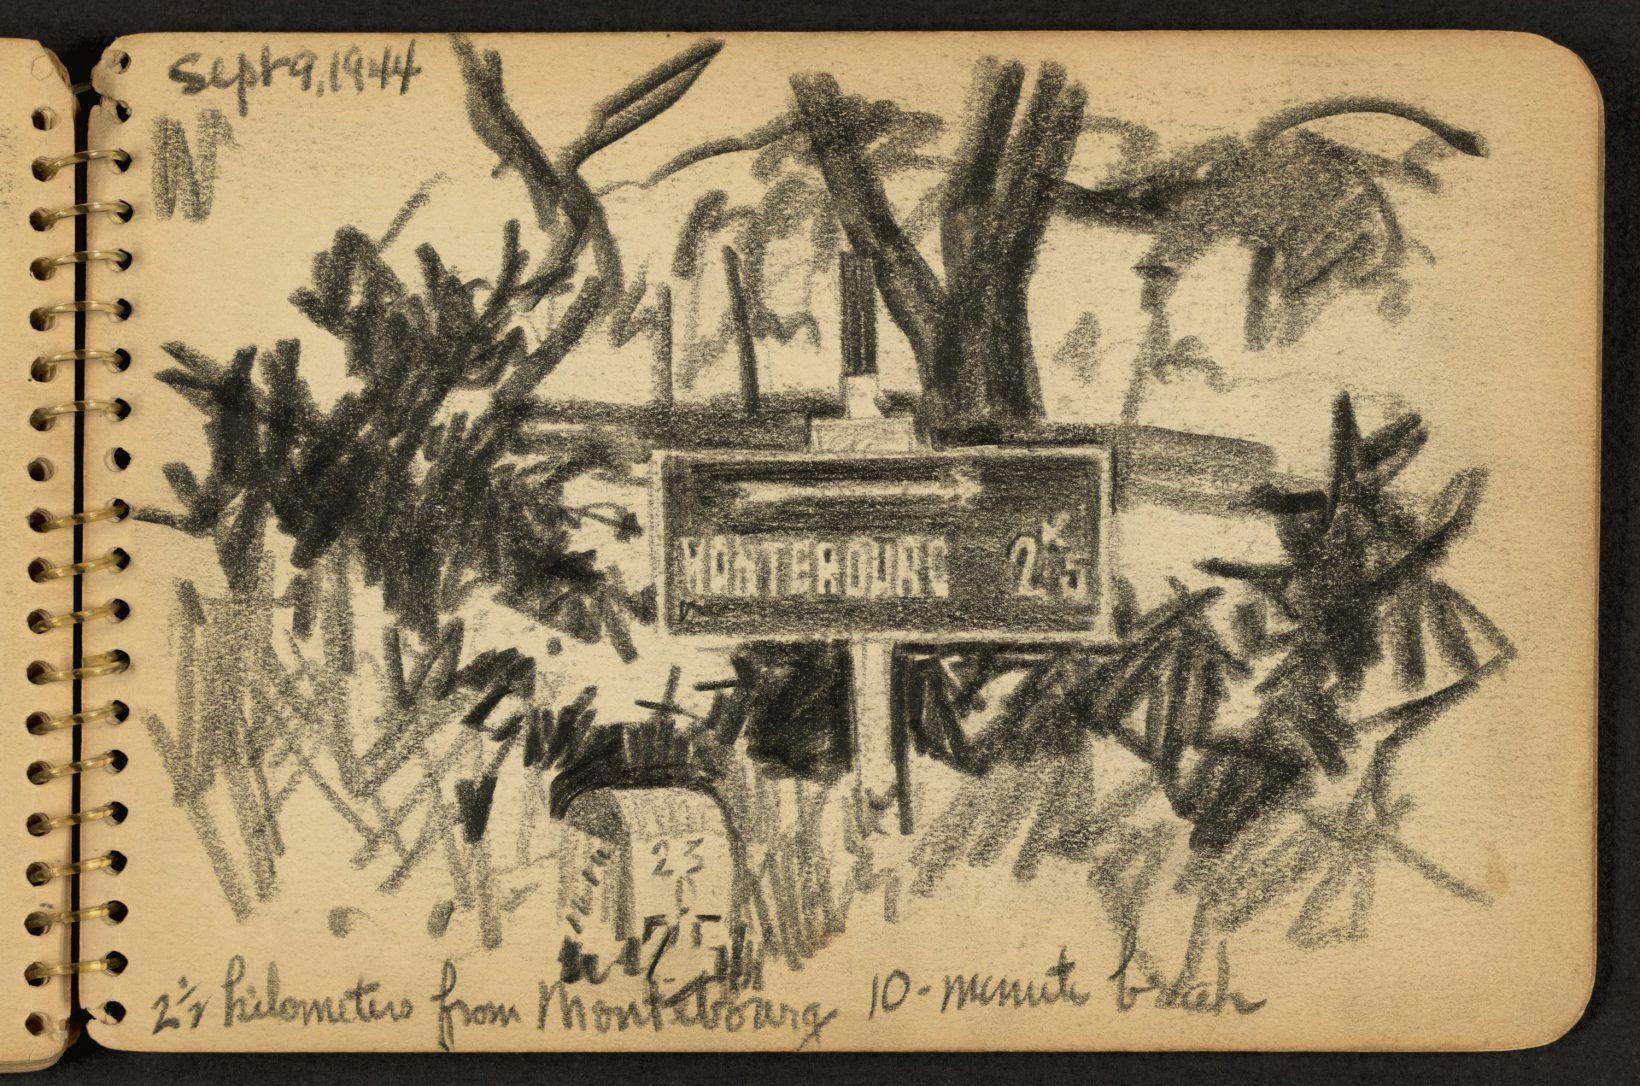 victor-lundy-carnet-croquis-seconde-guerre-mondiale-50